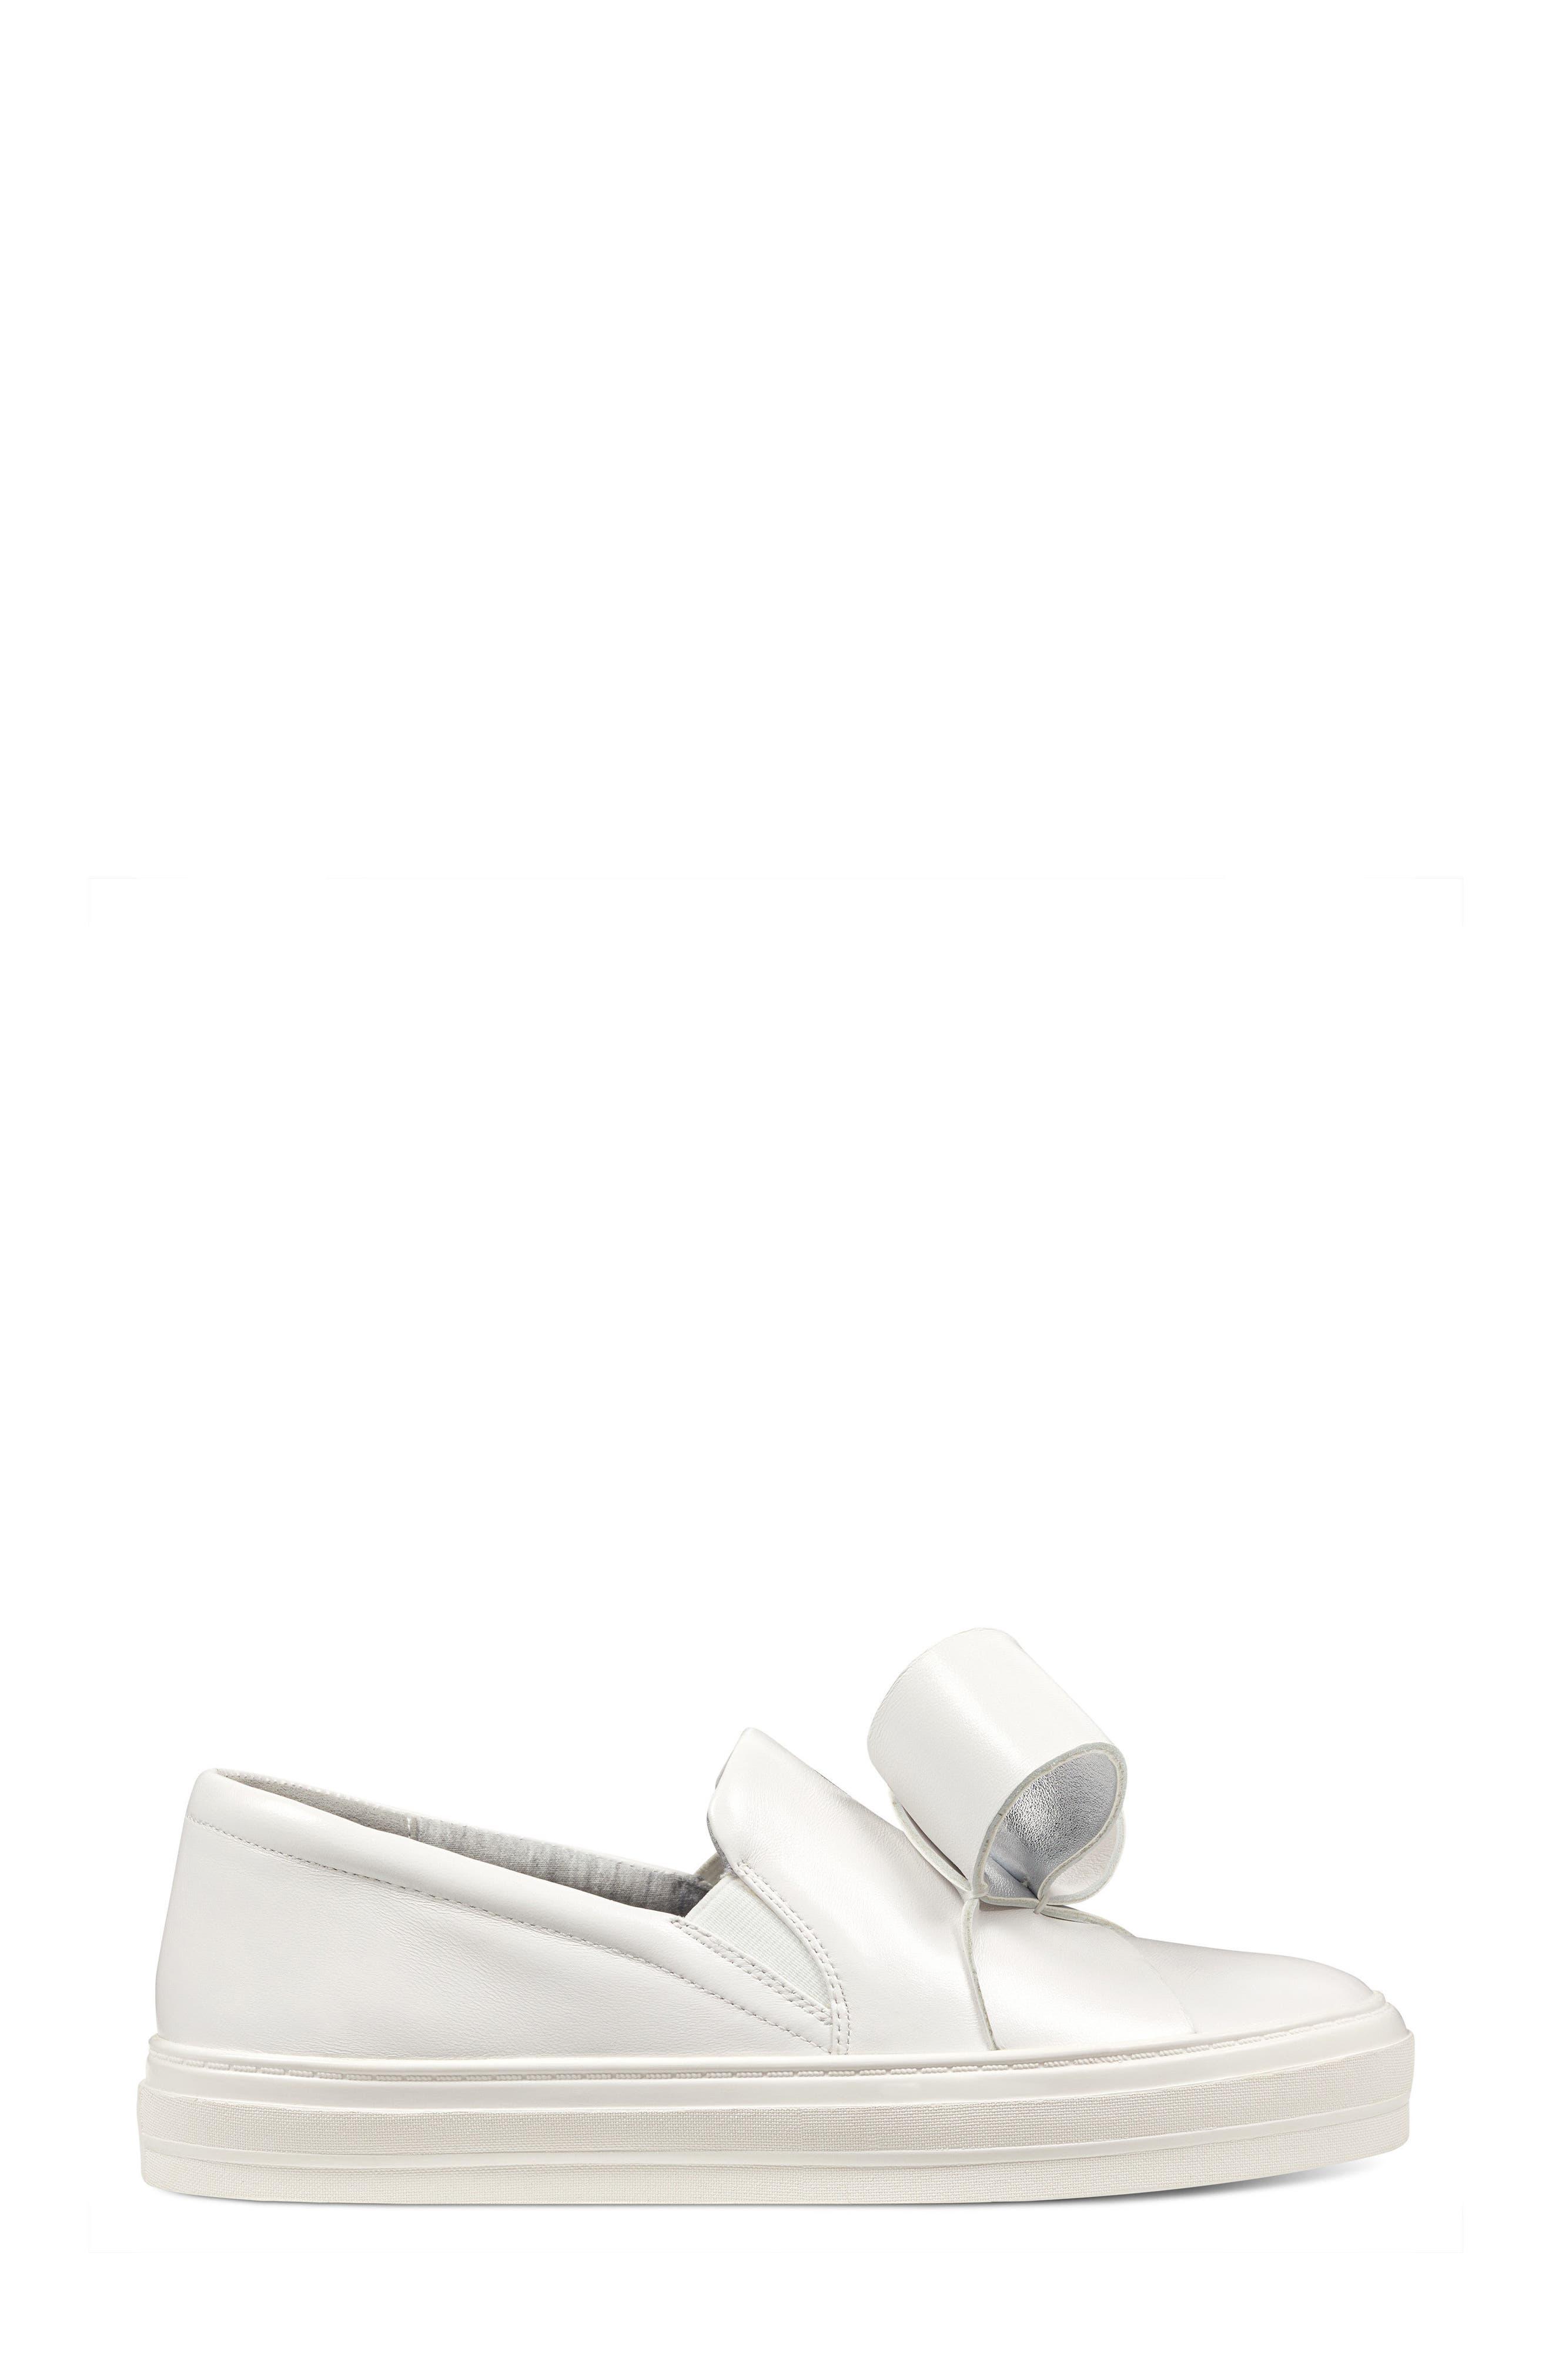 Odienella Slip-On Sneaker,                             Alternate thumbnail 3, color,                             White Multi Leather